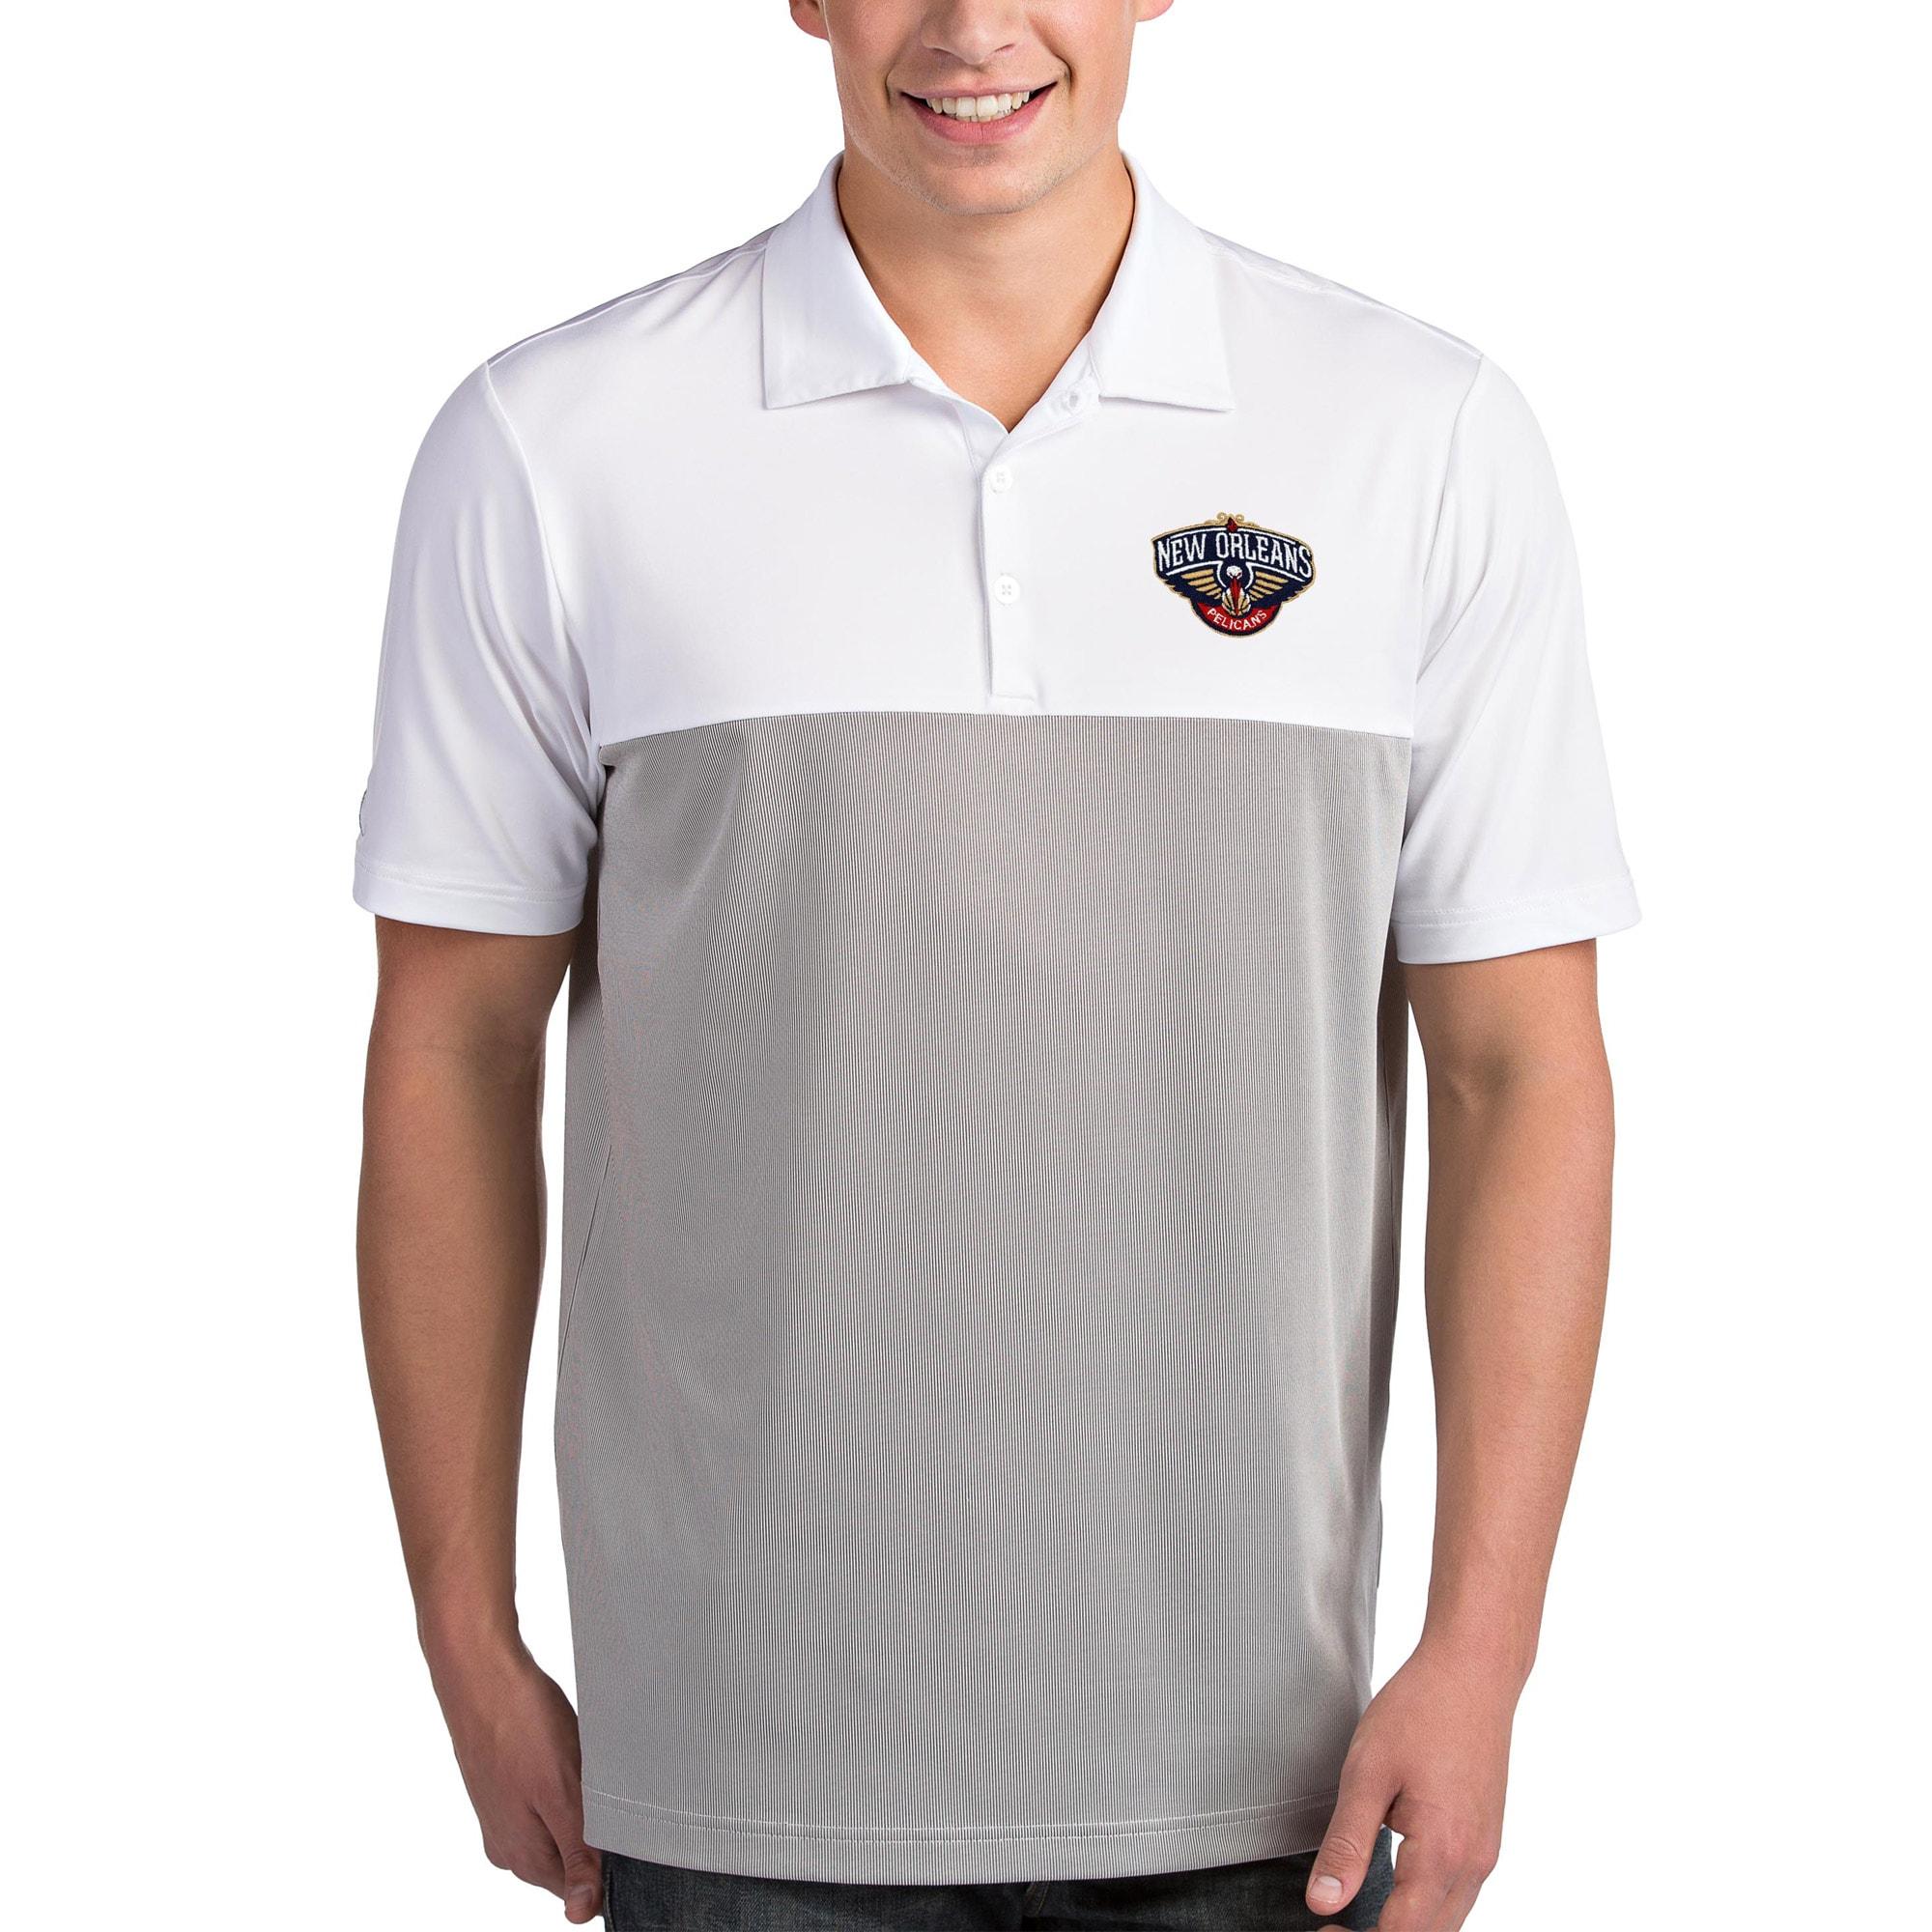 New Orleans Pelicans Antigua Venture Polo - White/Gray